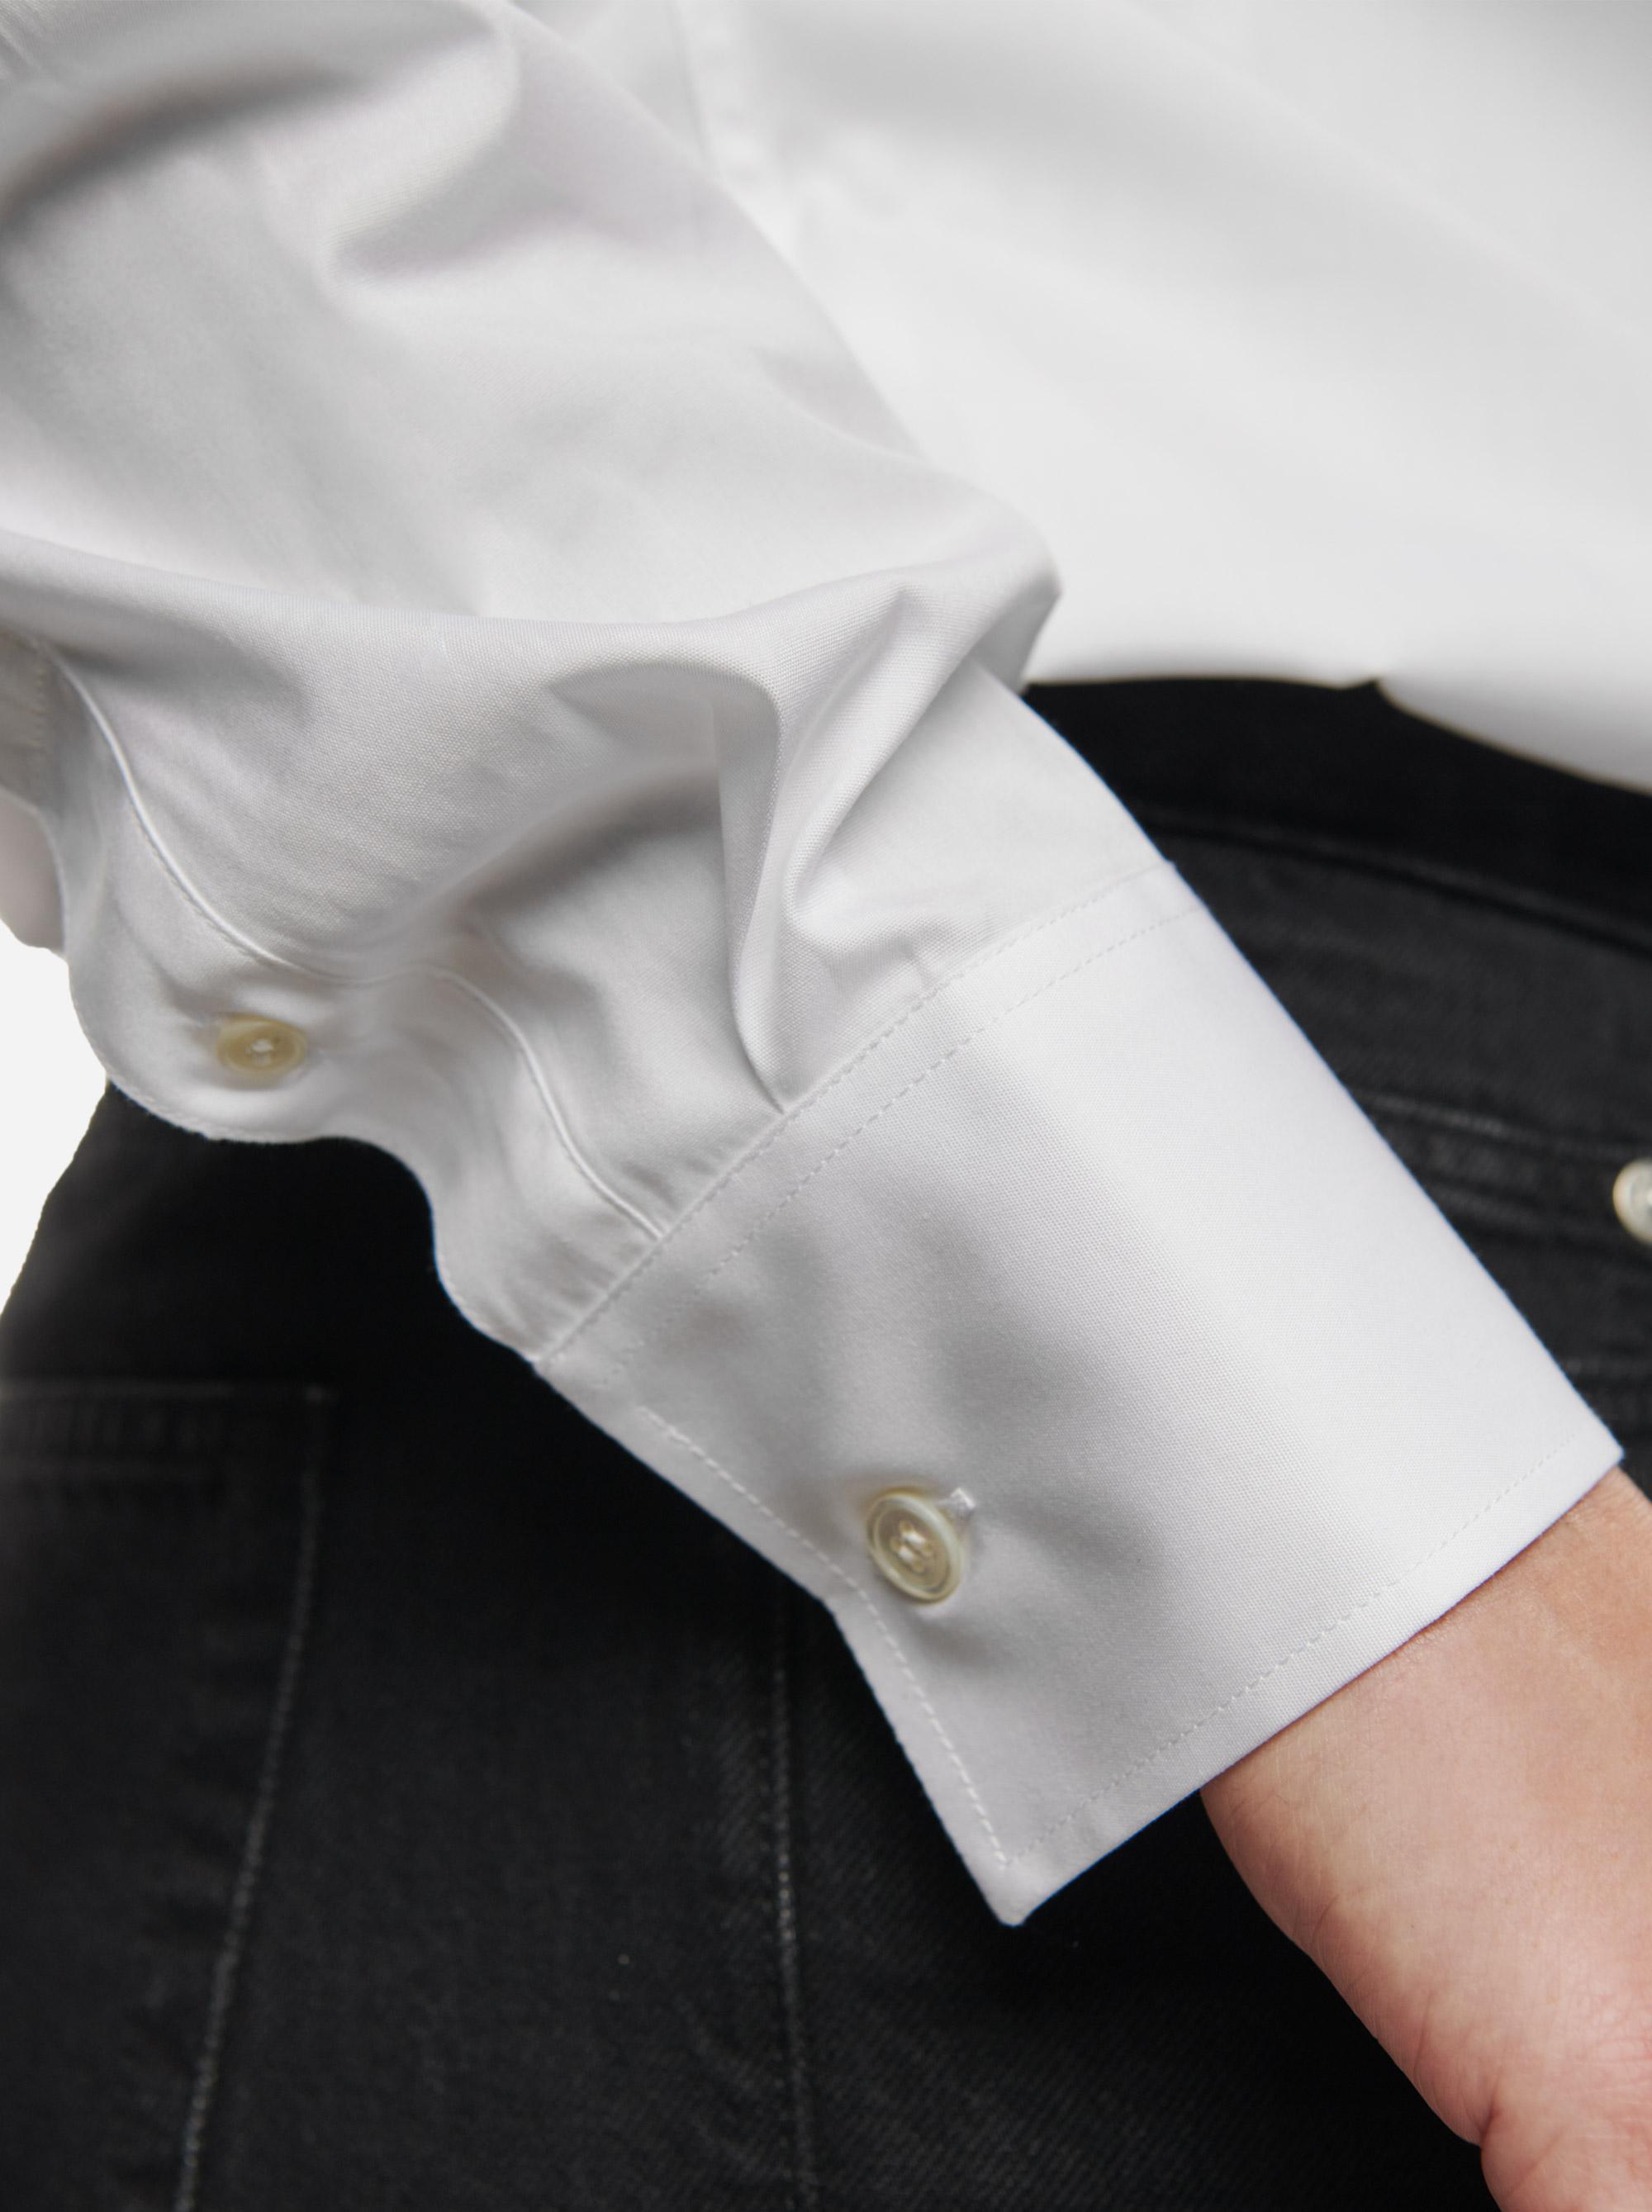 Teym-Shirt-White-women-mens-3